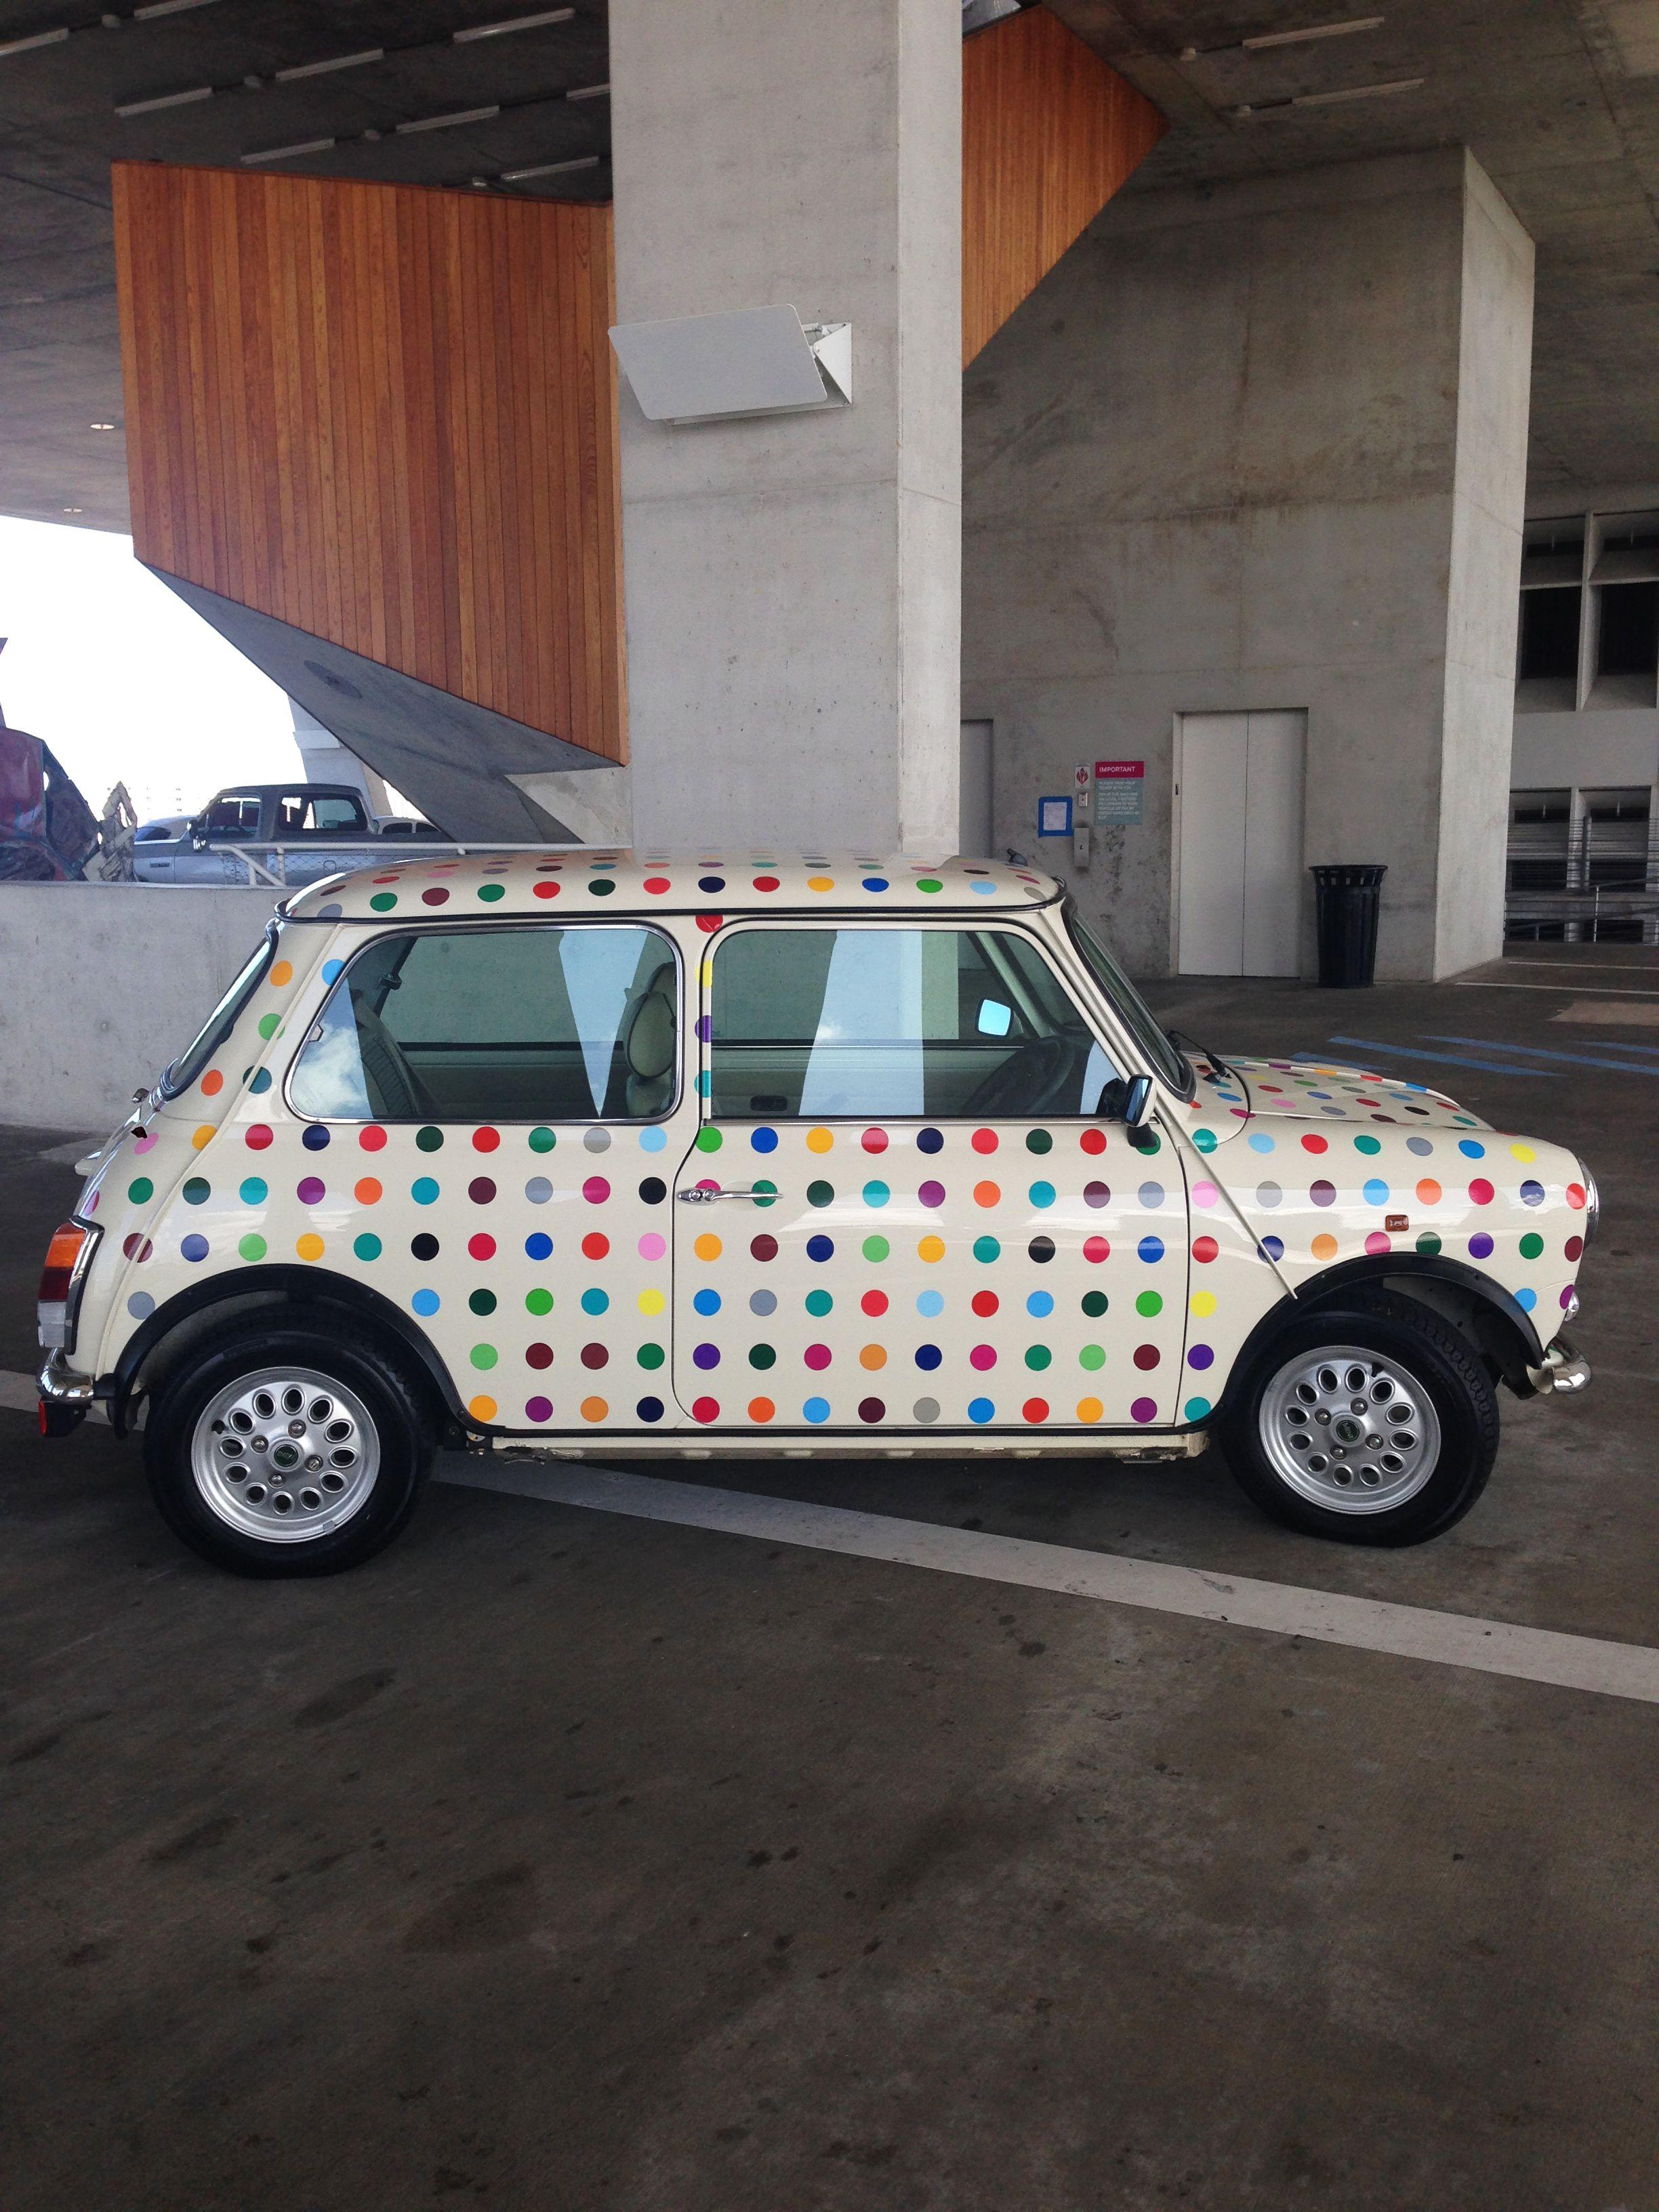 Fhm mini cooper top10 vehicle wraps mini cooper pinterest car wrap cars and vehicle signage